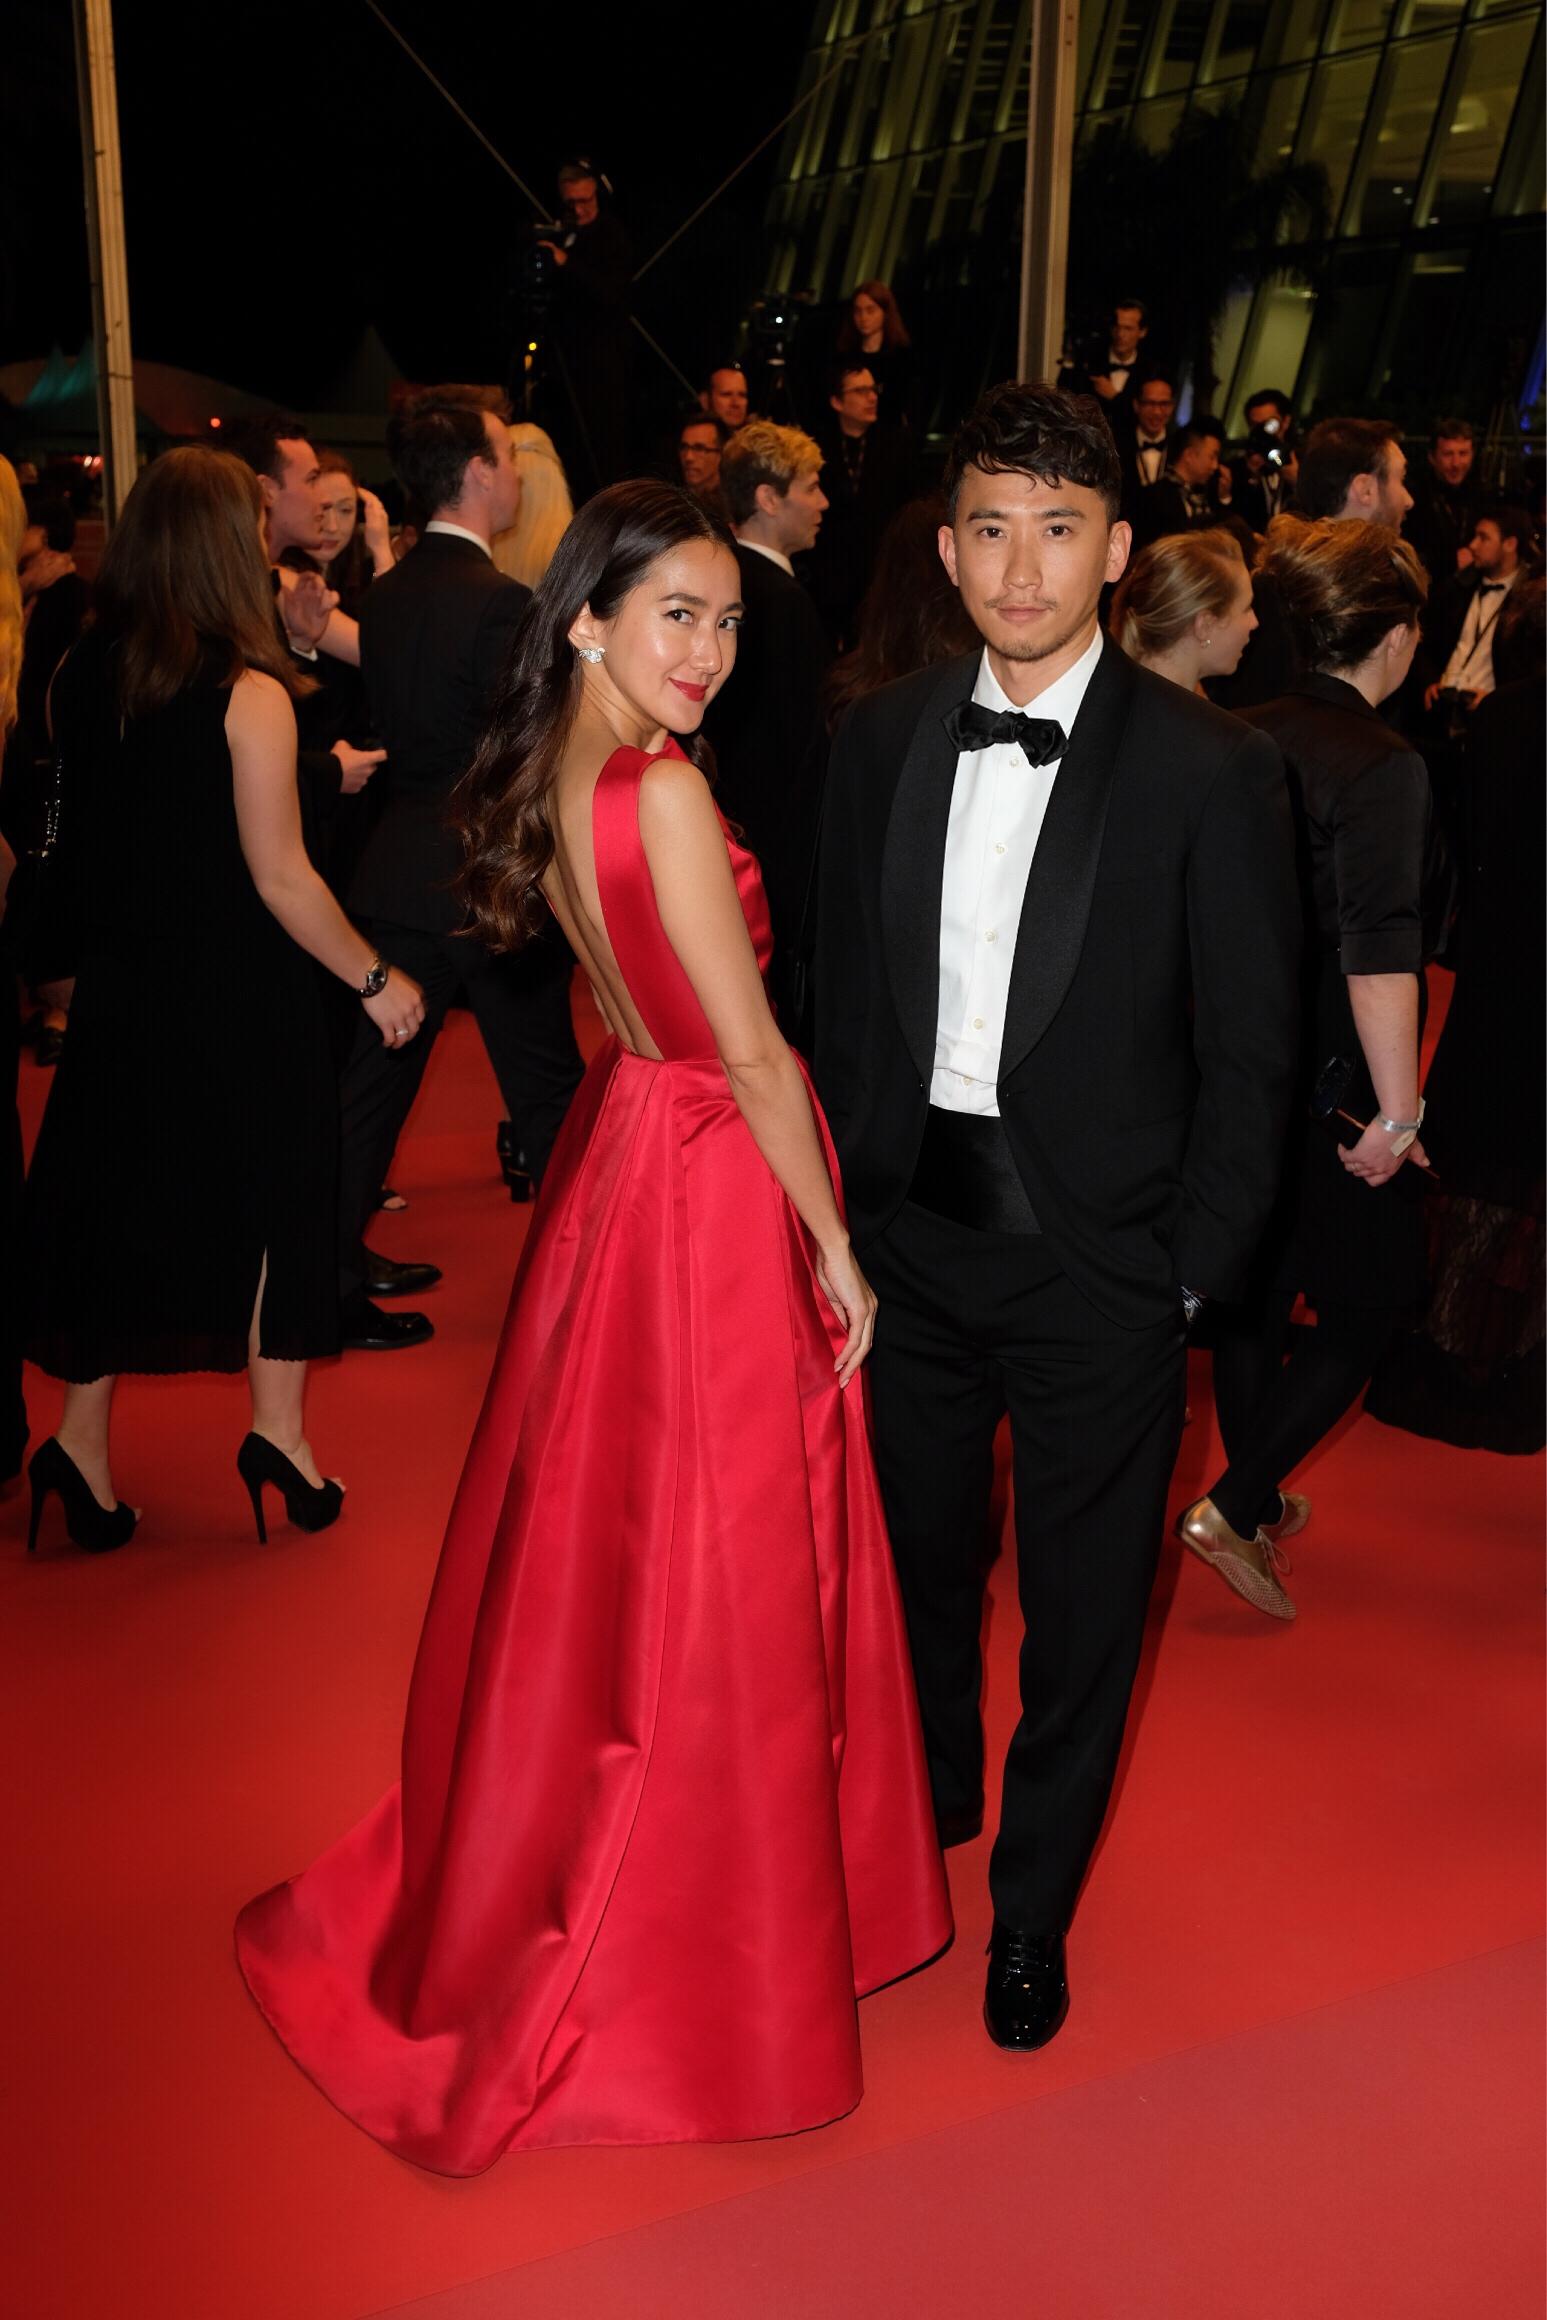 Love by Natsuさんがカンヌ国際映画祭で着たKatie Ermilio(ケイティ・エミリオ)の赤のドレス